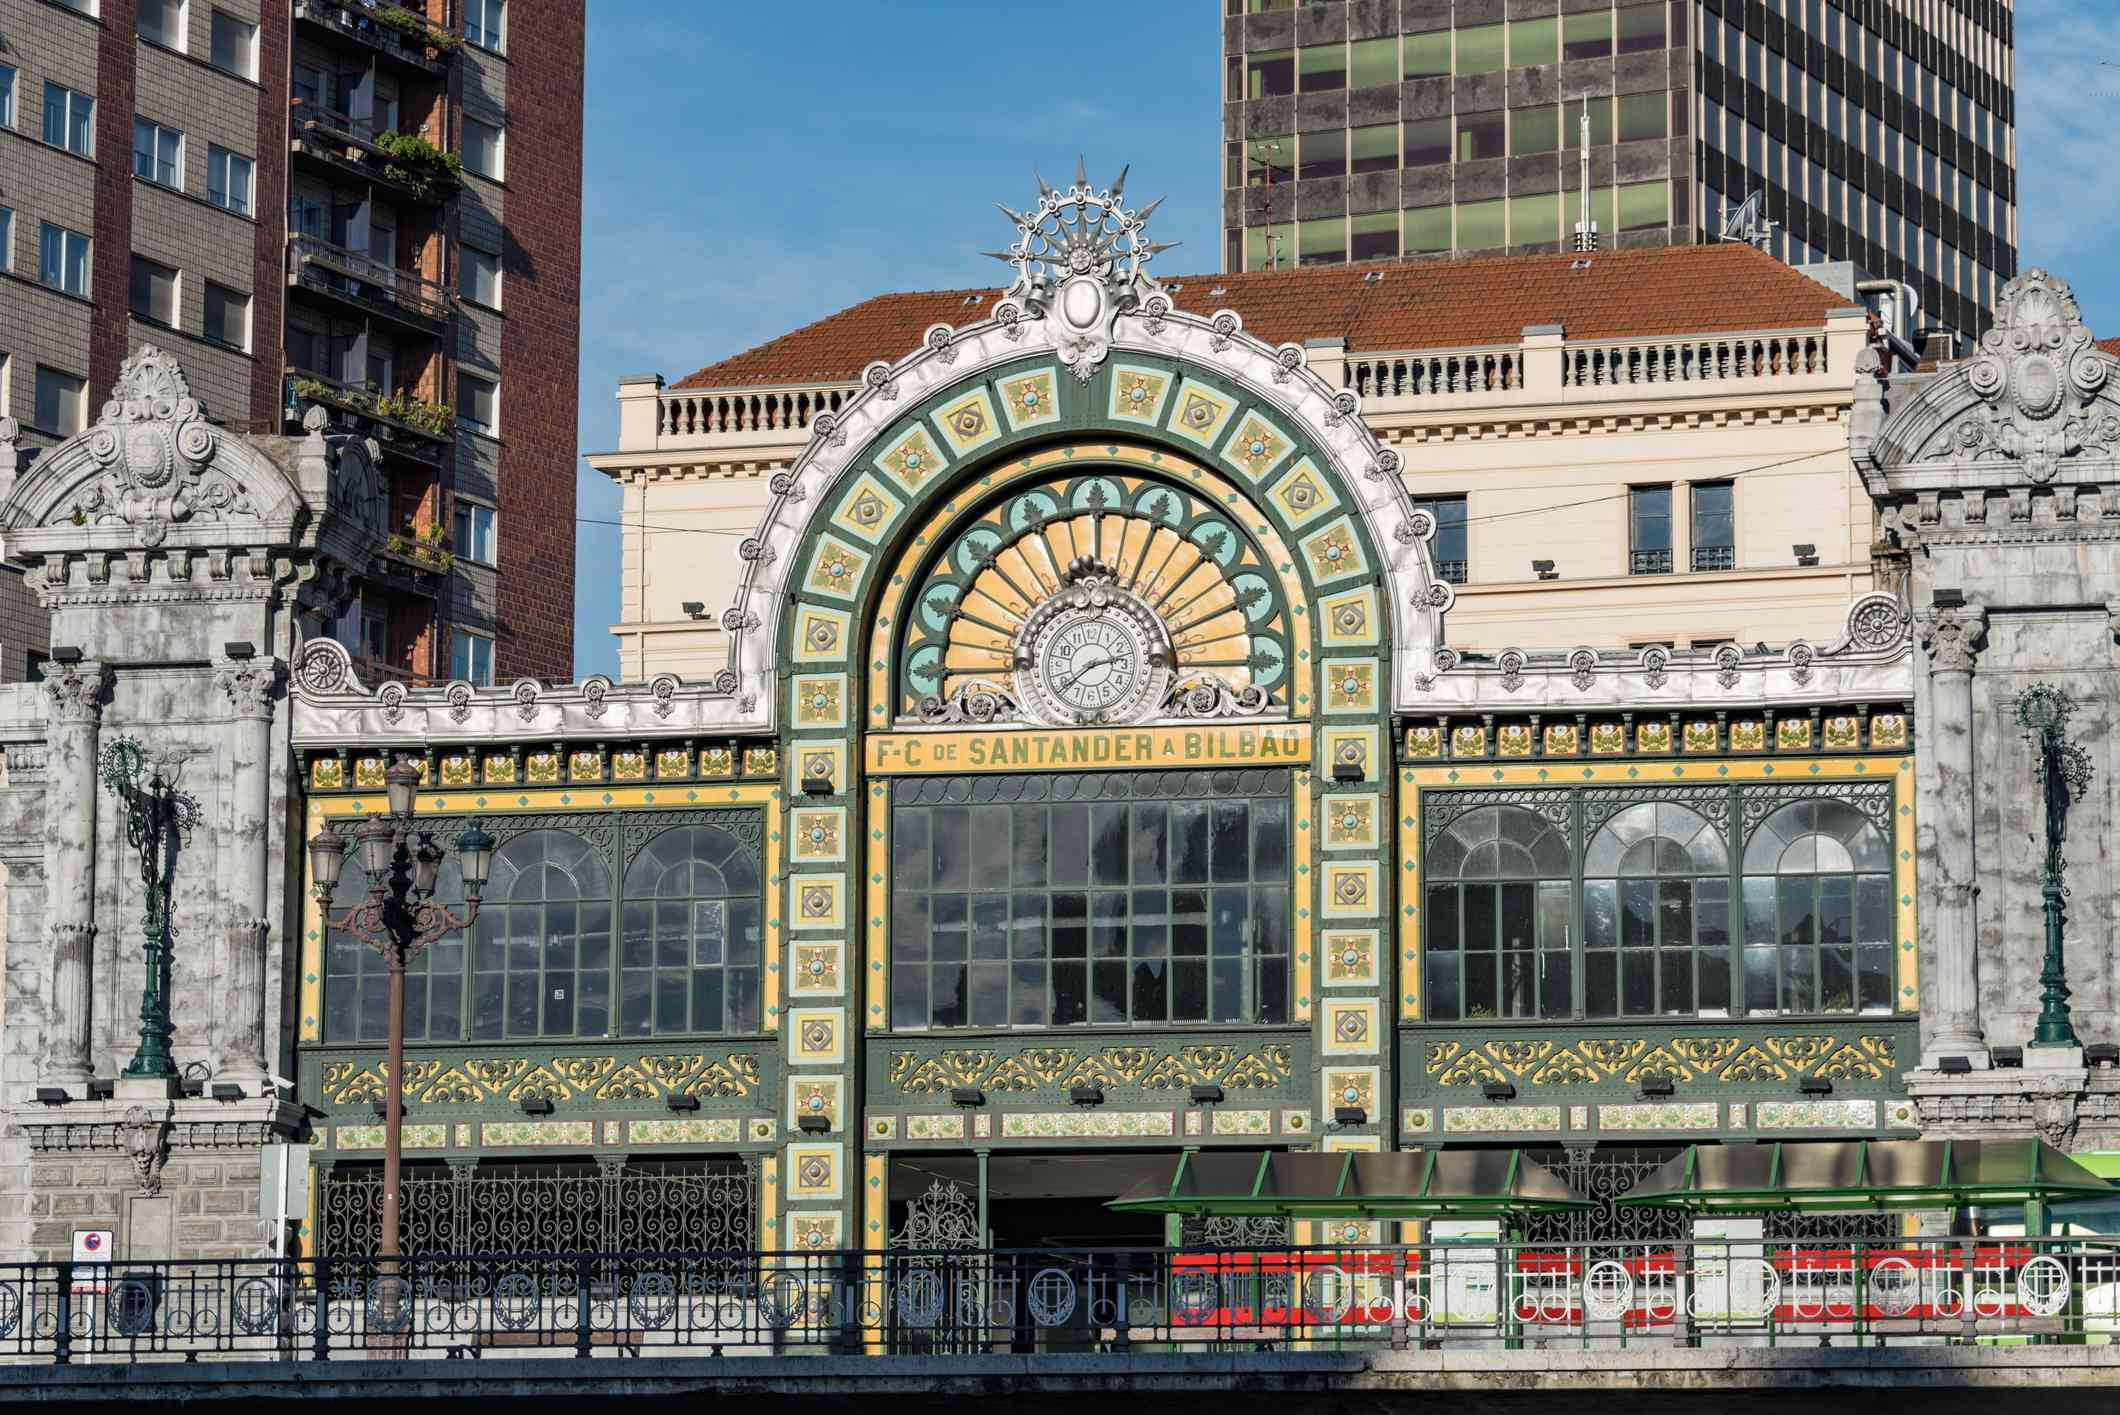 Bilbao Santander station, Bilbao Concordia station